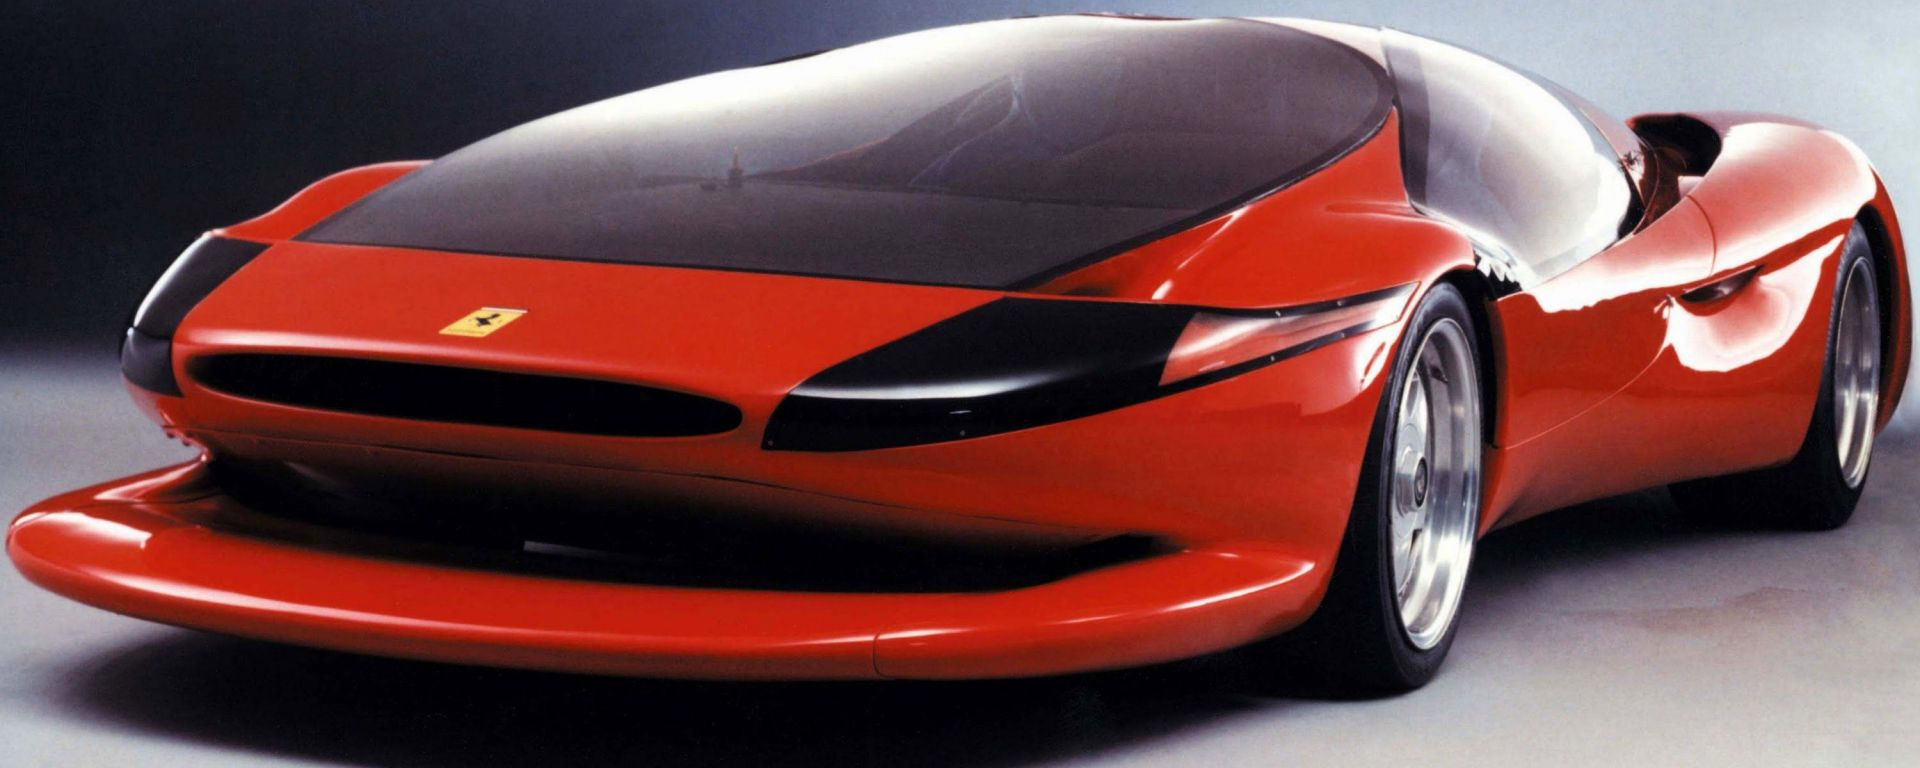 Colani Ferrari Testa d'Oro